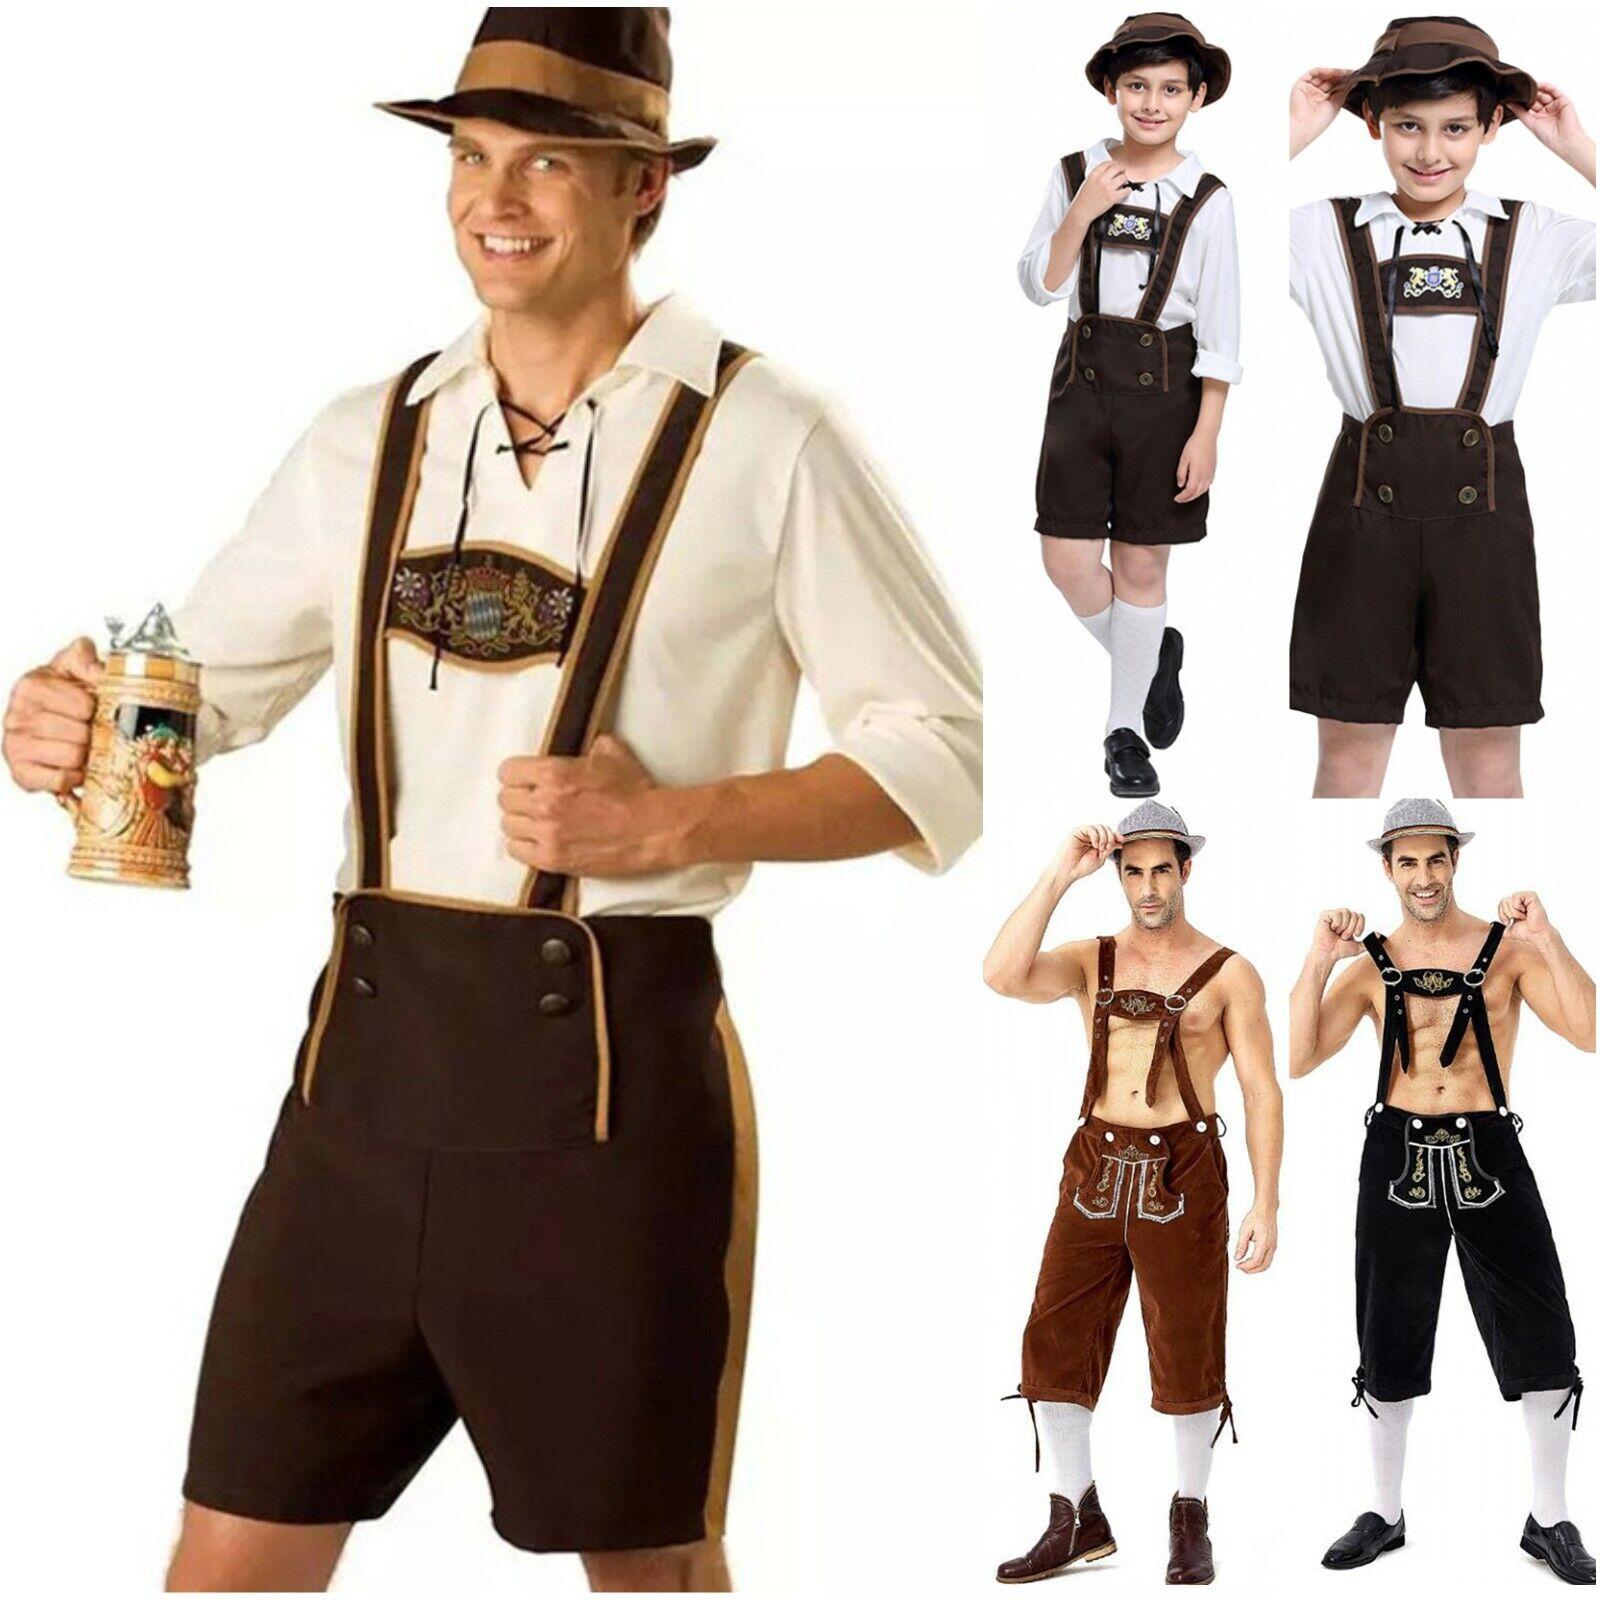 Bavarian Man Oktoberfest Octoberfest Lederhosen Beer Fancy Dress Costume S-XL